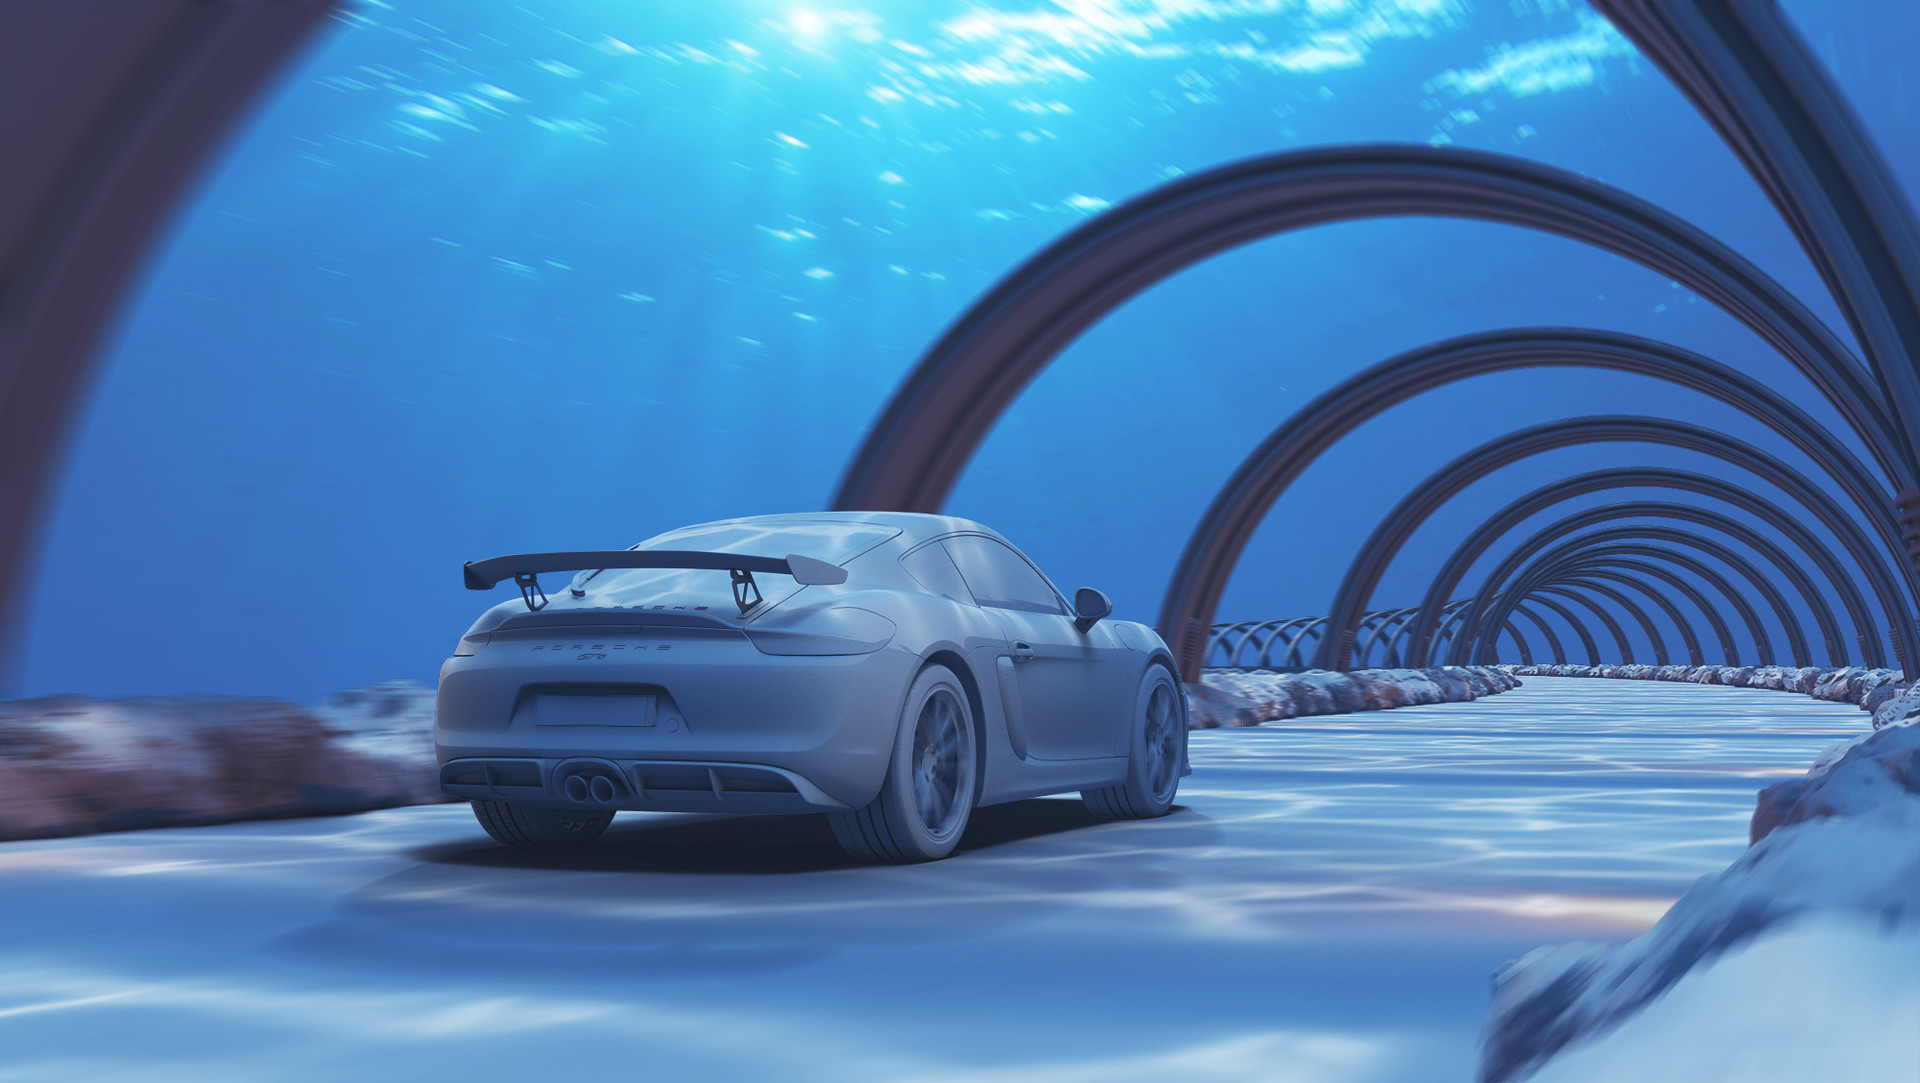 Porsche Underwater Road Cg Inspiration Hum3d